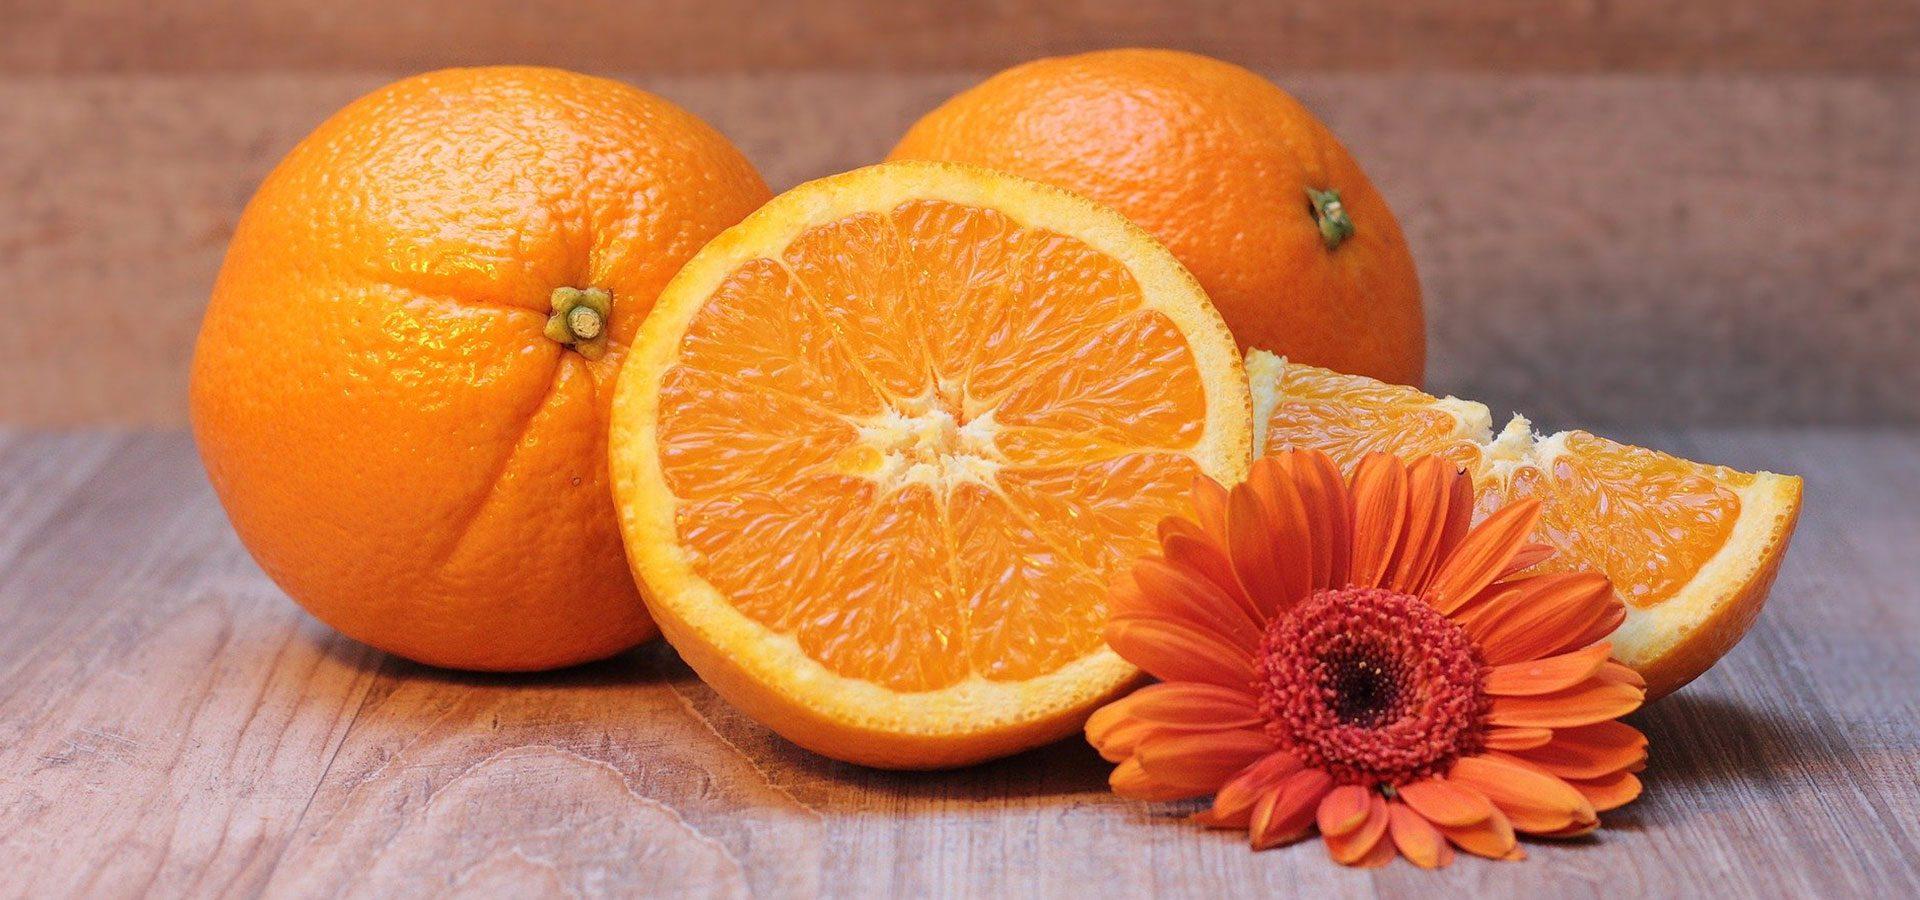 1920x900 orange